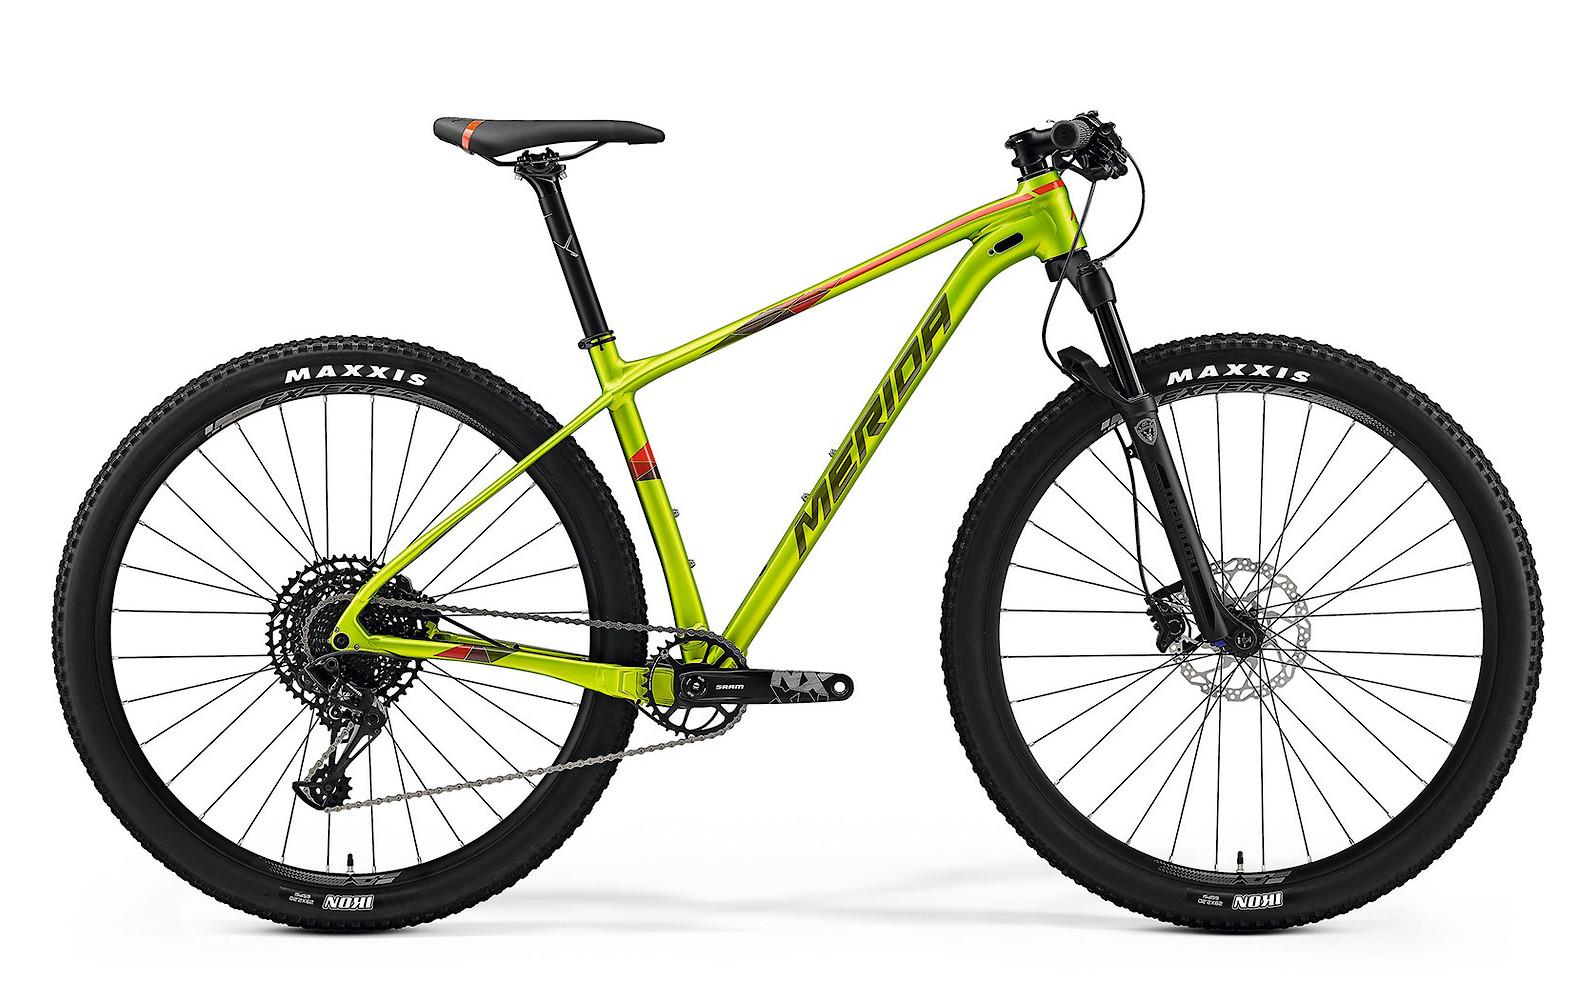 2019 Merida Big.Nine NX Edition Bike